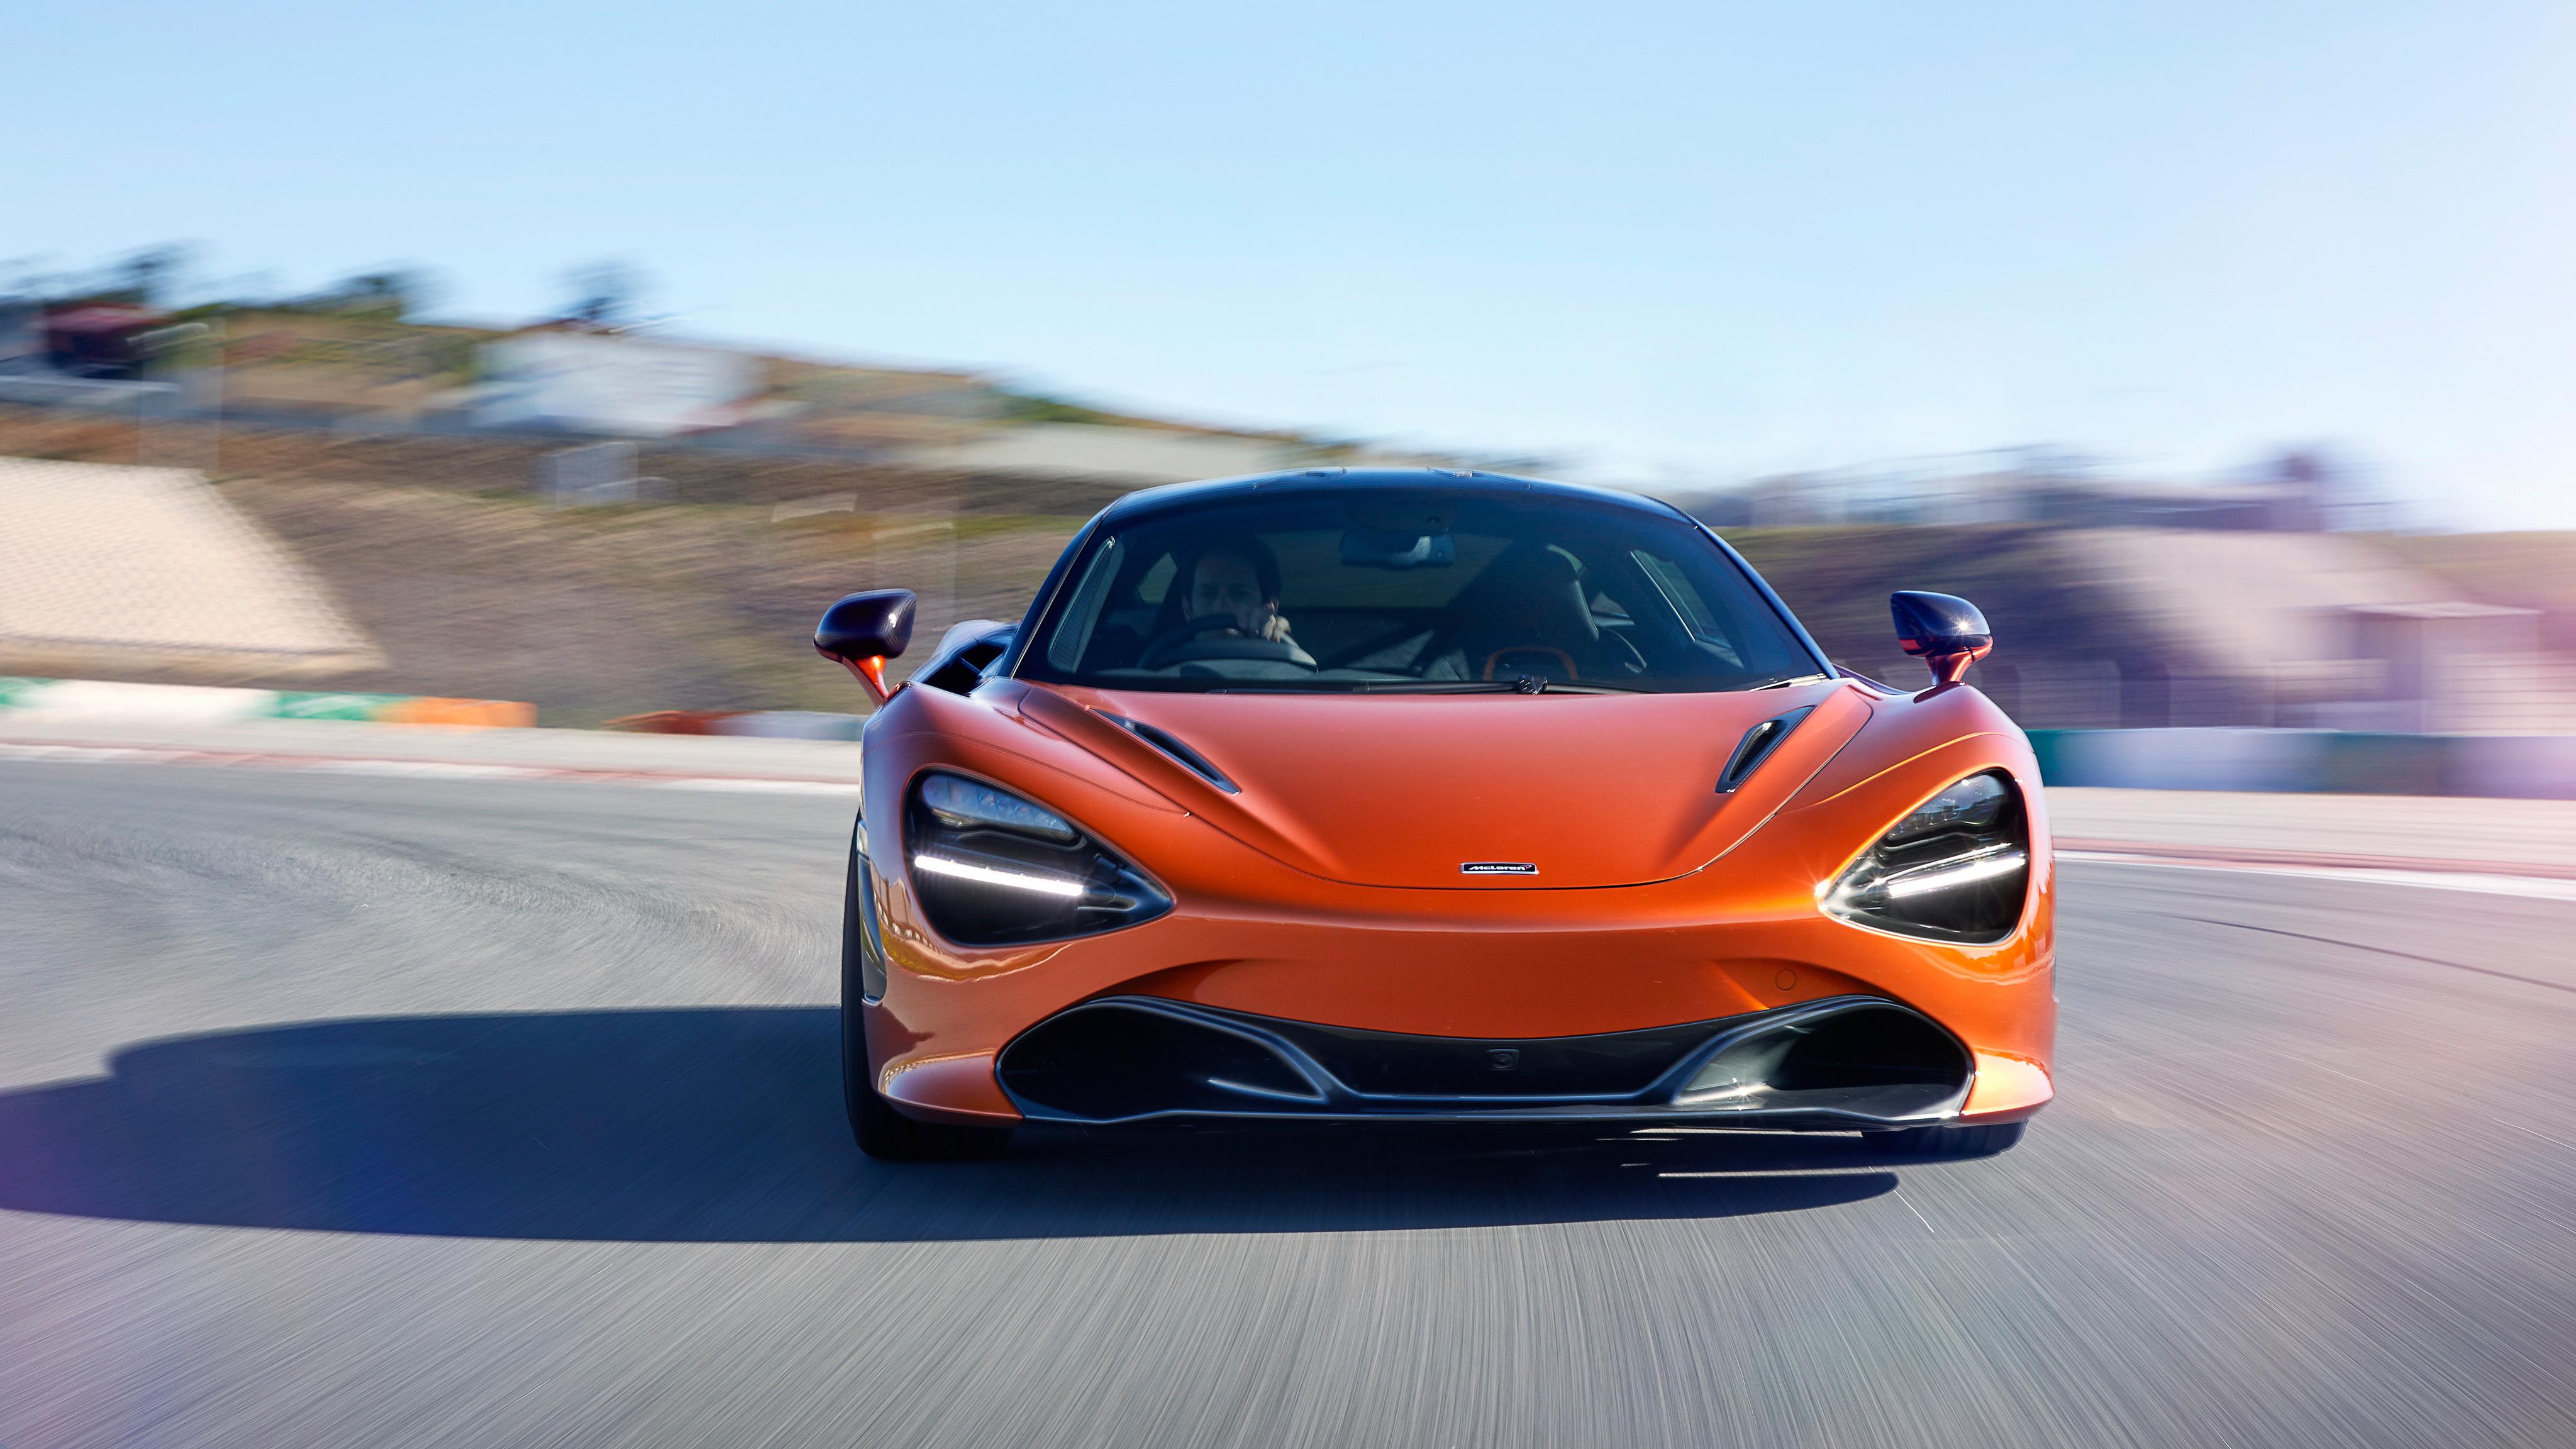 McLaren 720s Coupe 2017 Wallpaper | HD Car Wallpapers | ID ...